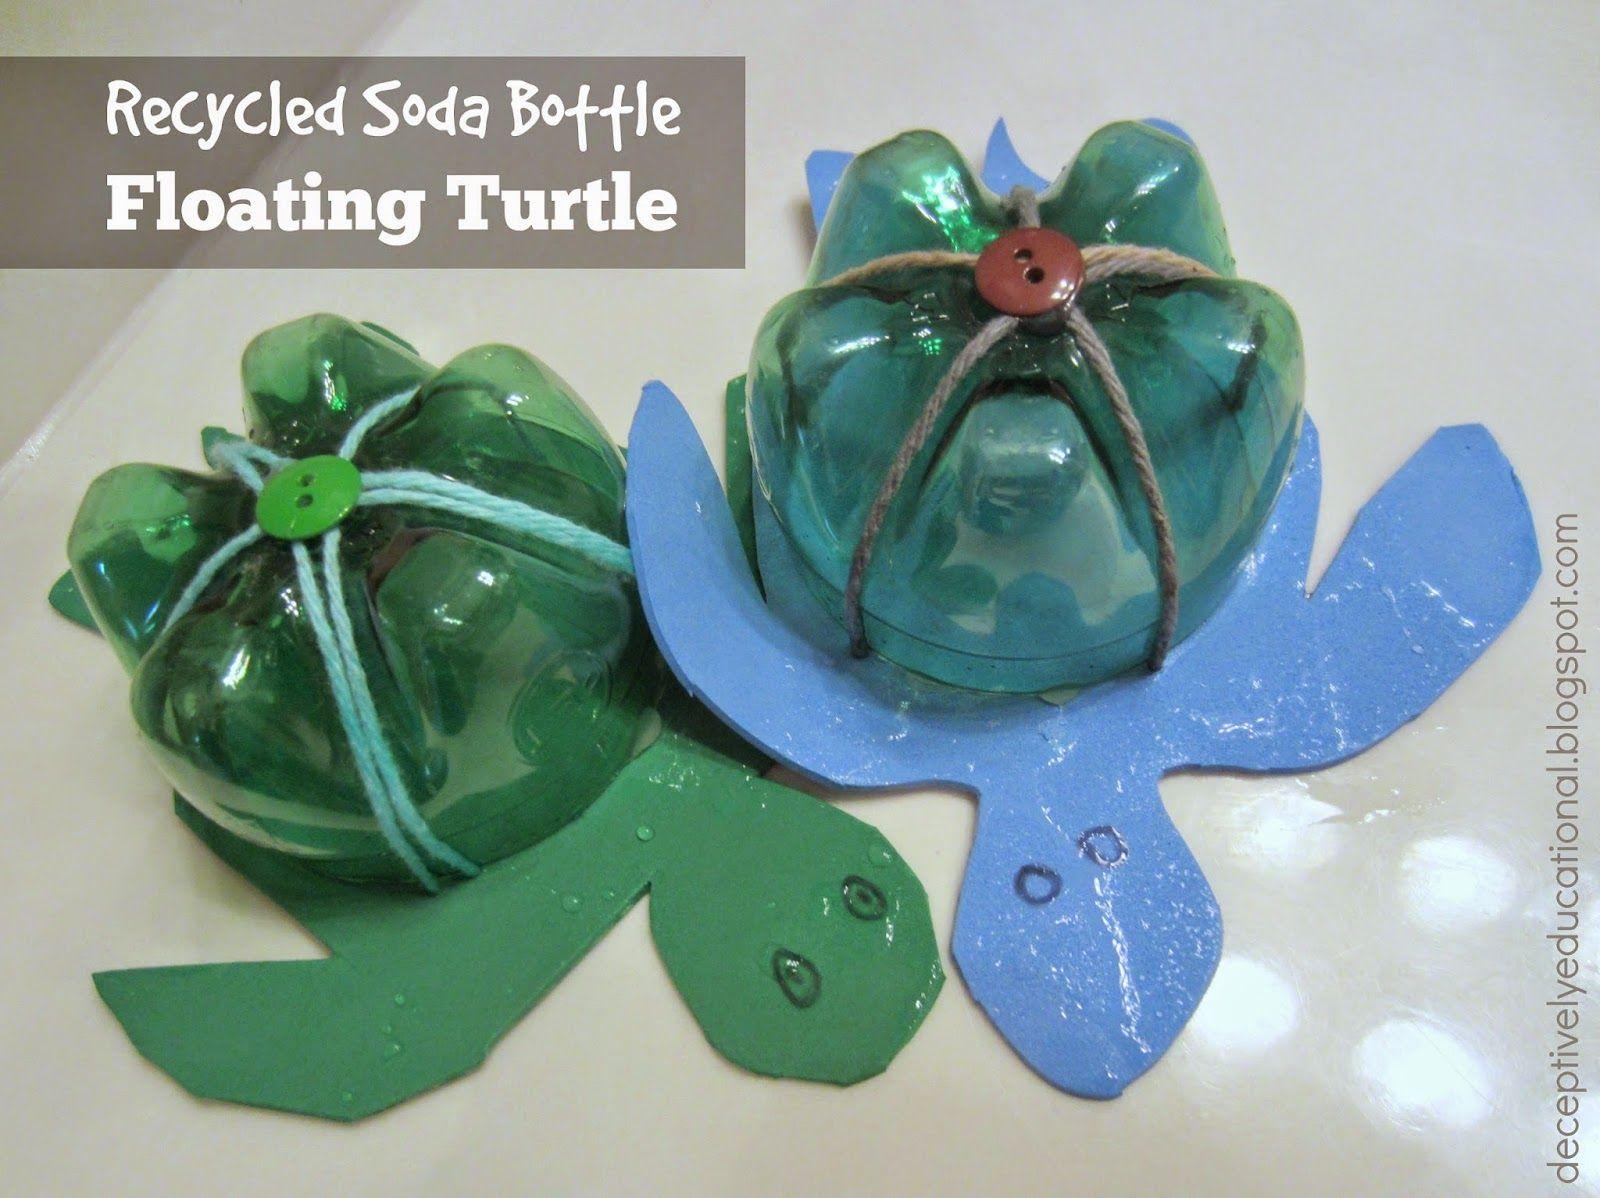 Recycled Soda Bottle Floating Turtle Relentlessly Fun